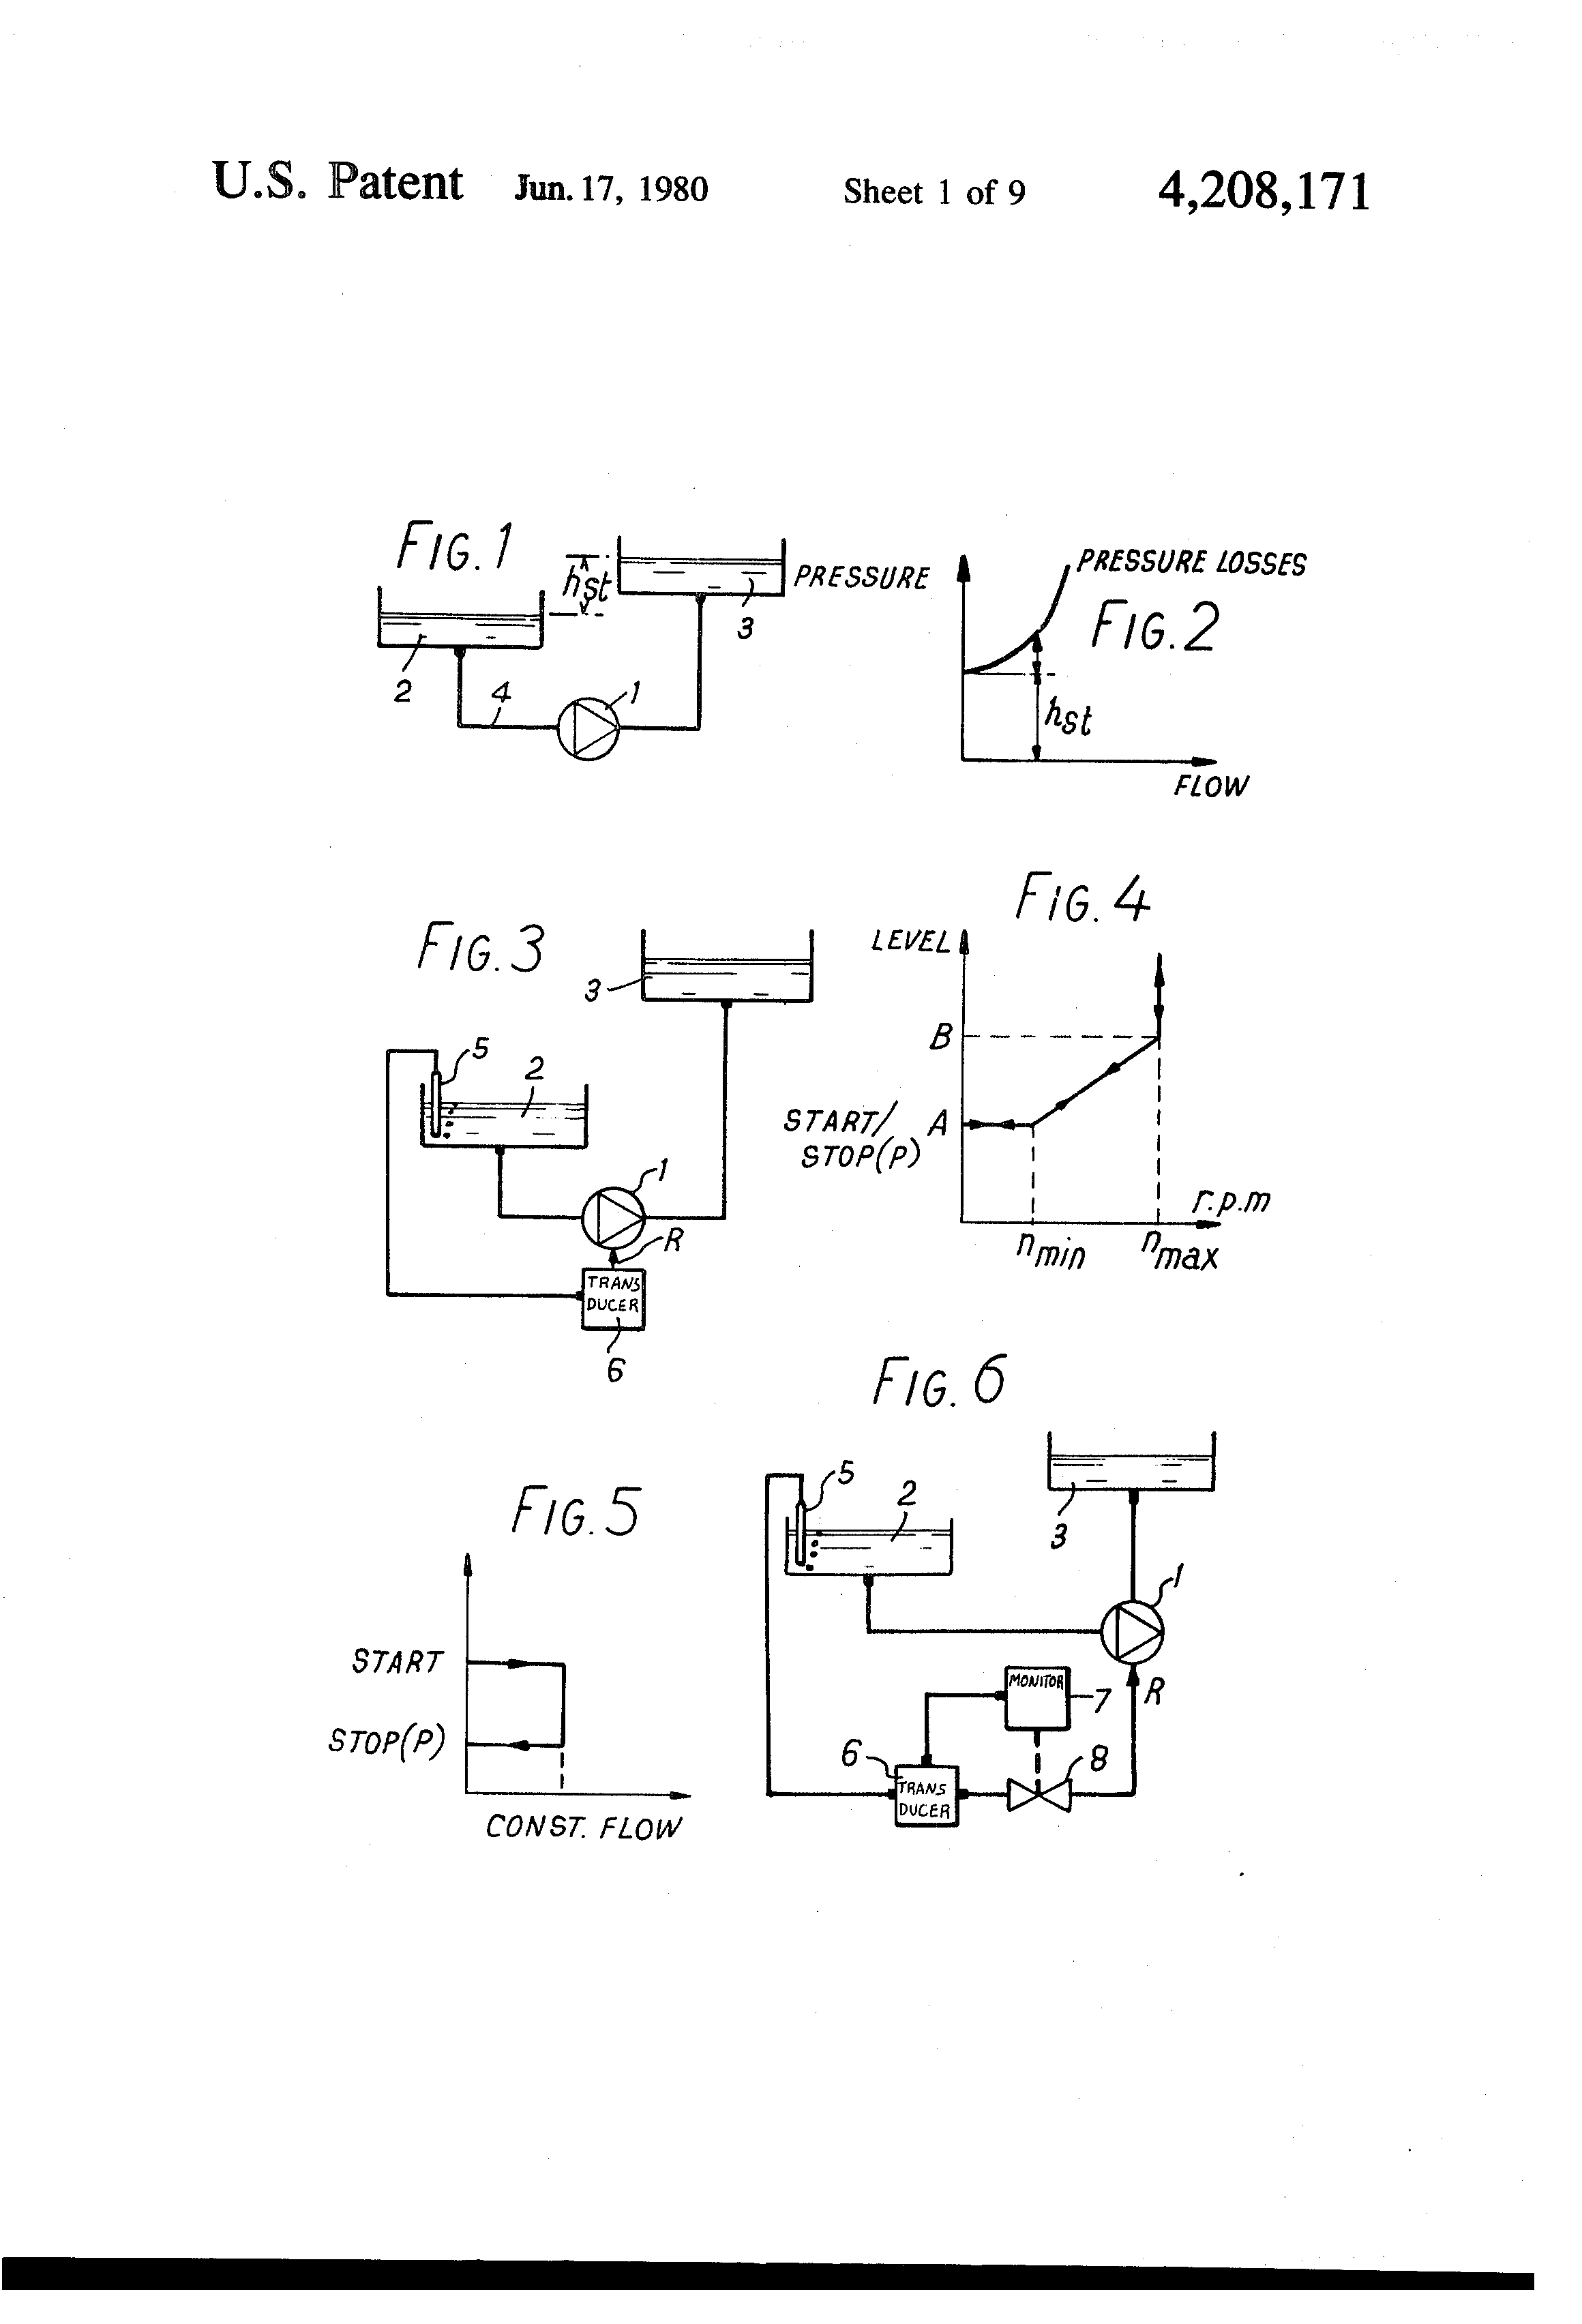 US4208171 1 flygt pump wiring diagram flygt pump wiring diagrams single phase flygt pump wiring diagram at mifinder.co